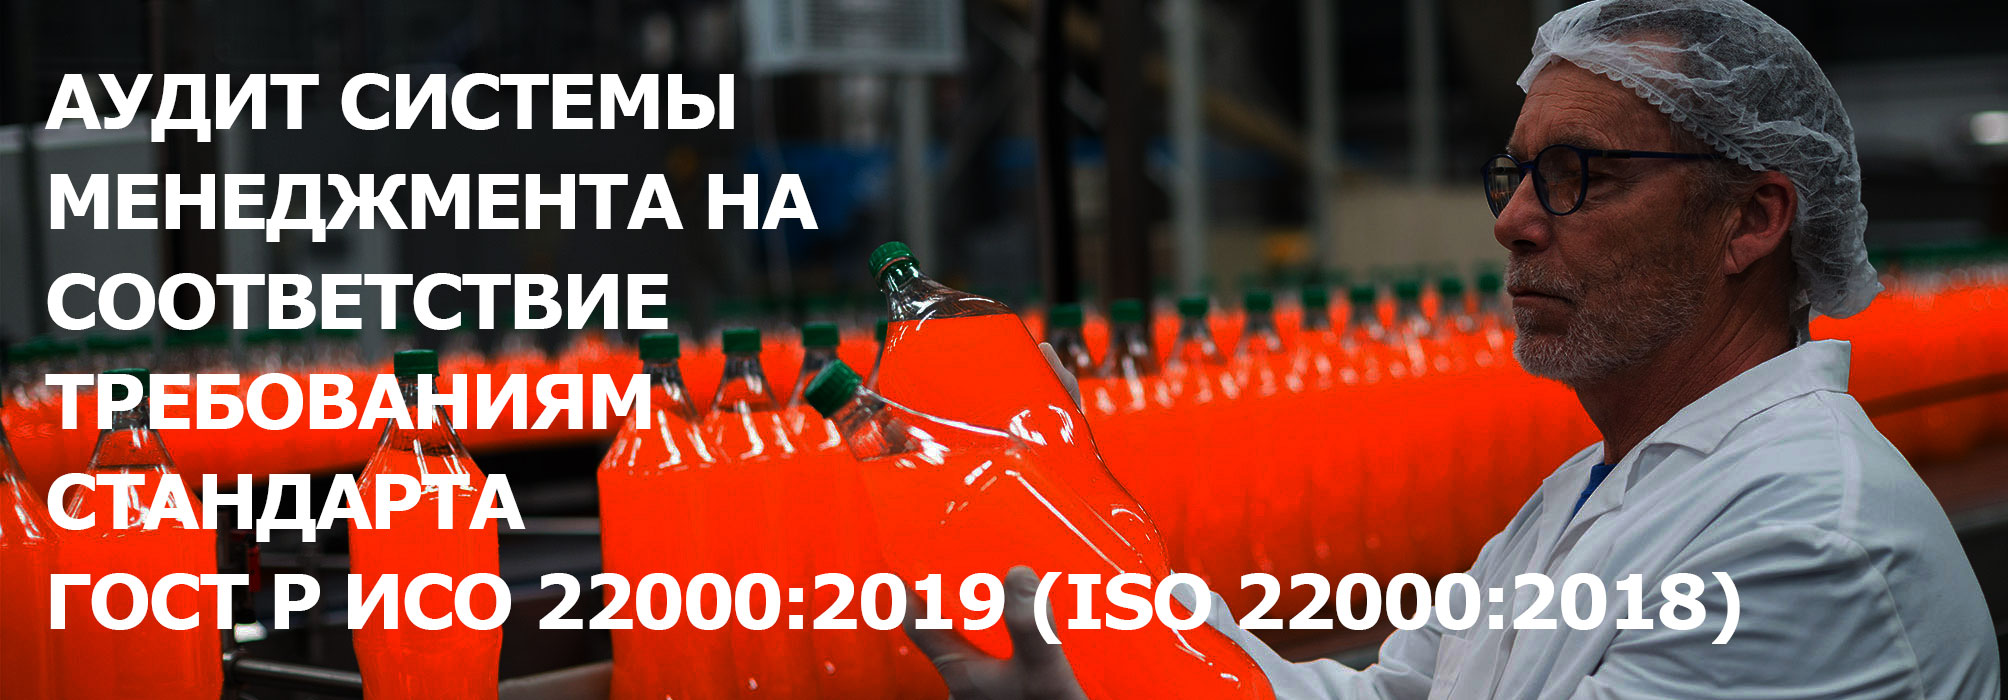 АУДИТ СИСТЕМЫ МЕНЕДЖМЕНТА НА СООТВЕТСТВИЕ ТРЕБОВАНИЯМ СТАНДАРТА ГОСТ Р ИСО 22000:2019 (ISO 22000:2018)